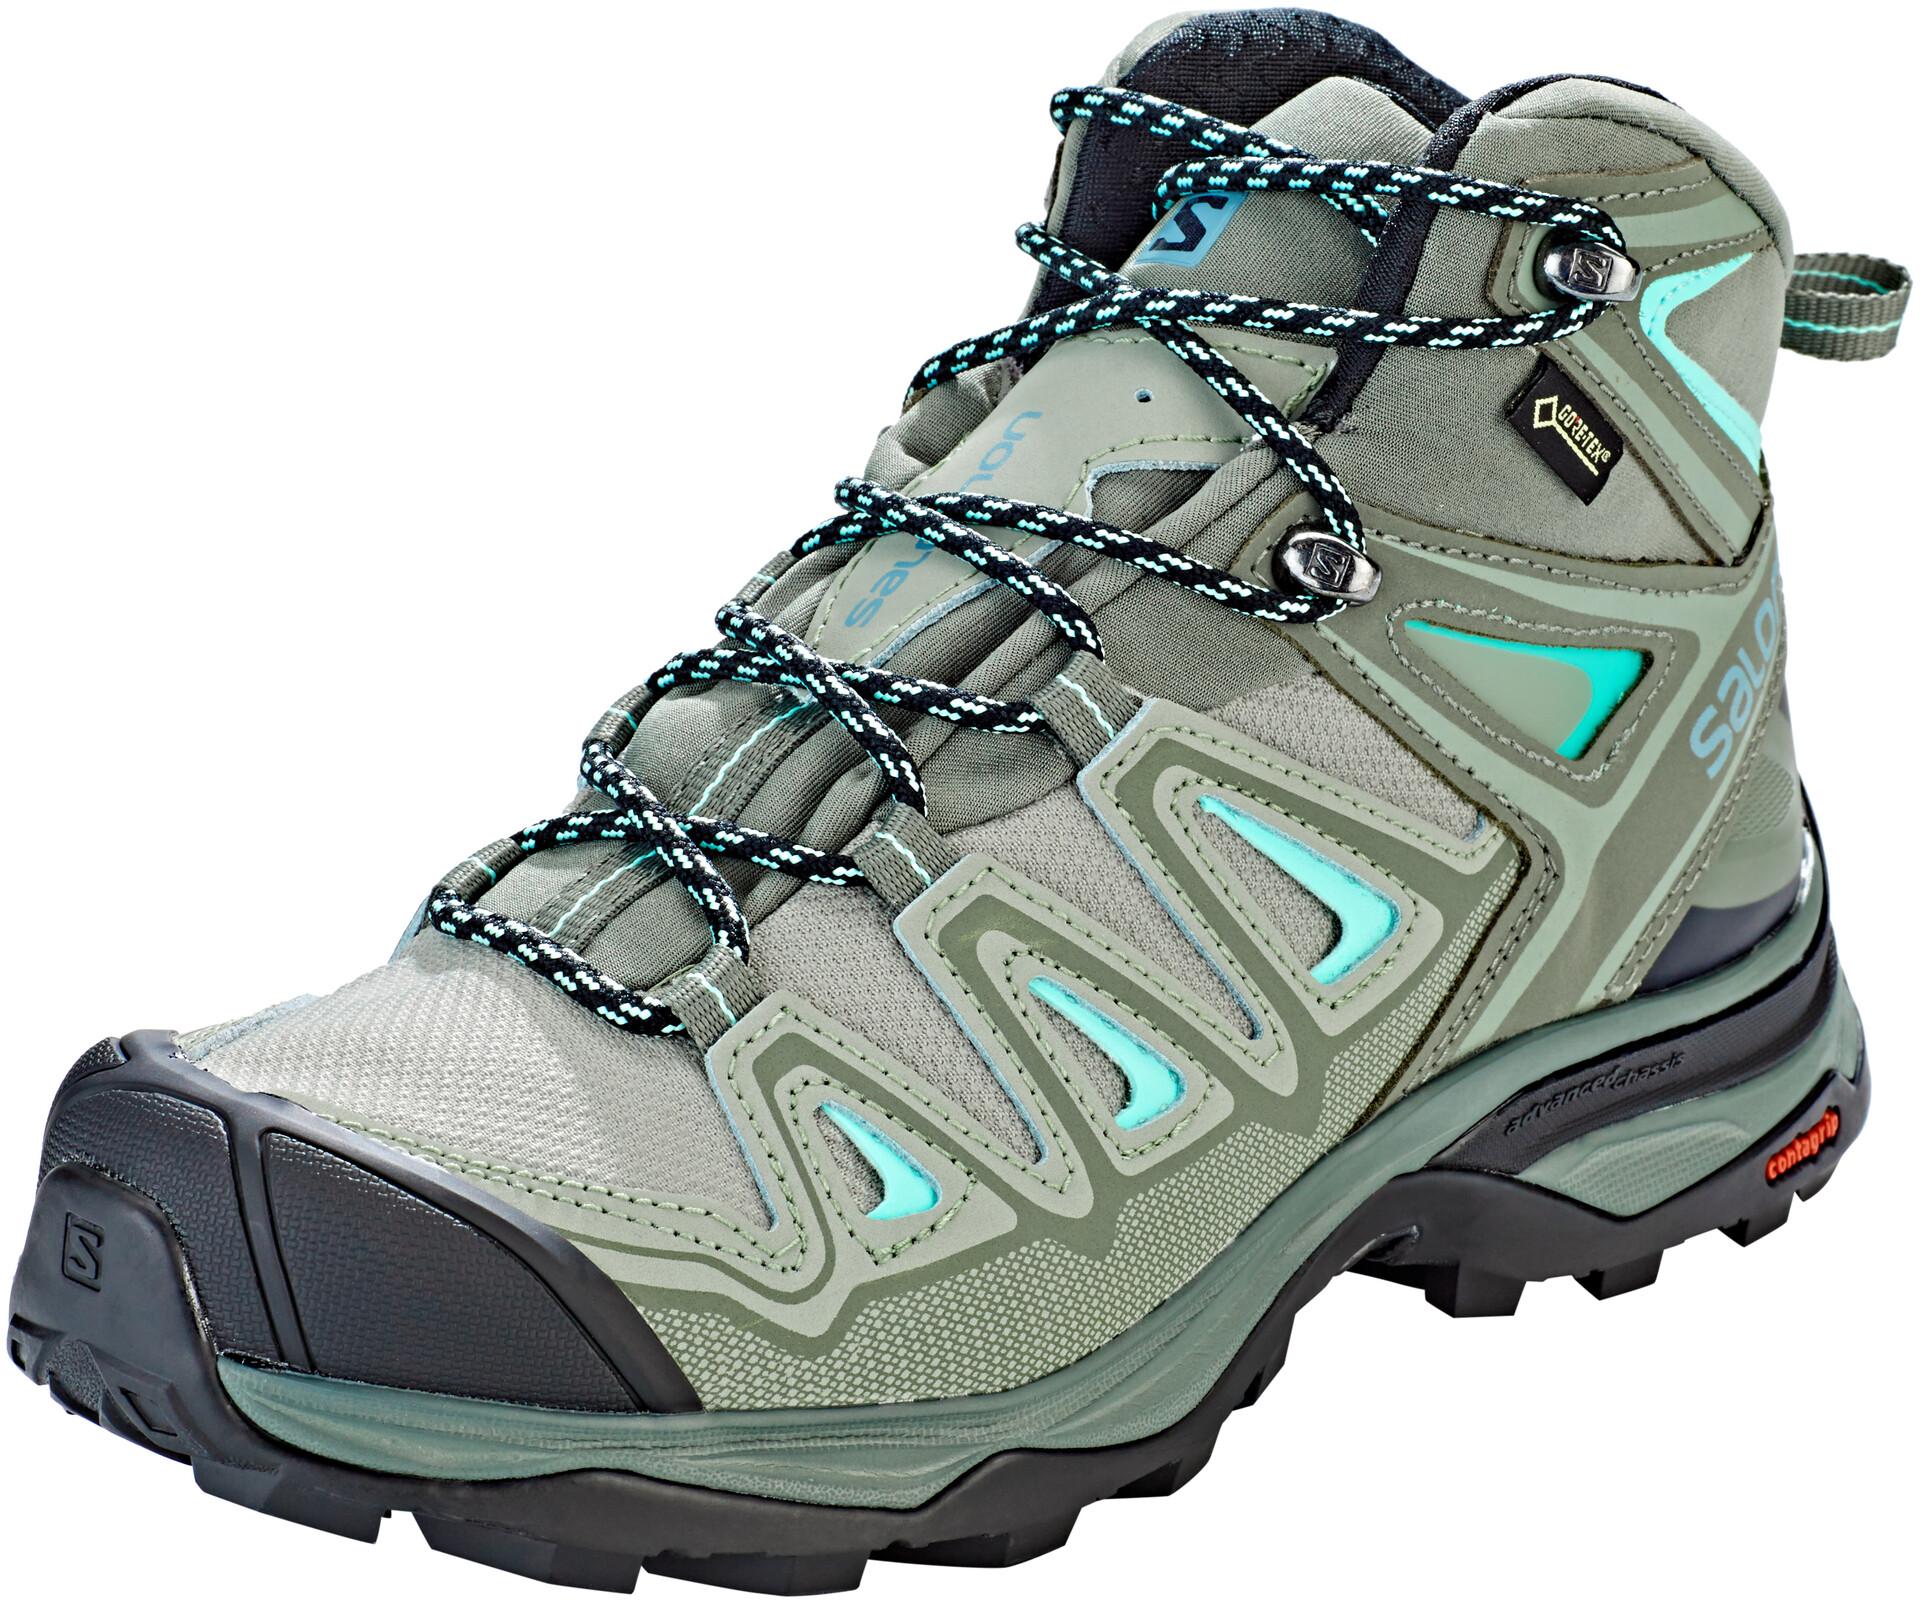 Salomon X Ultra 3 Mid GTX Shoes Damen shadowcastor graybeach glass